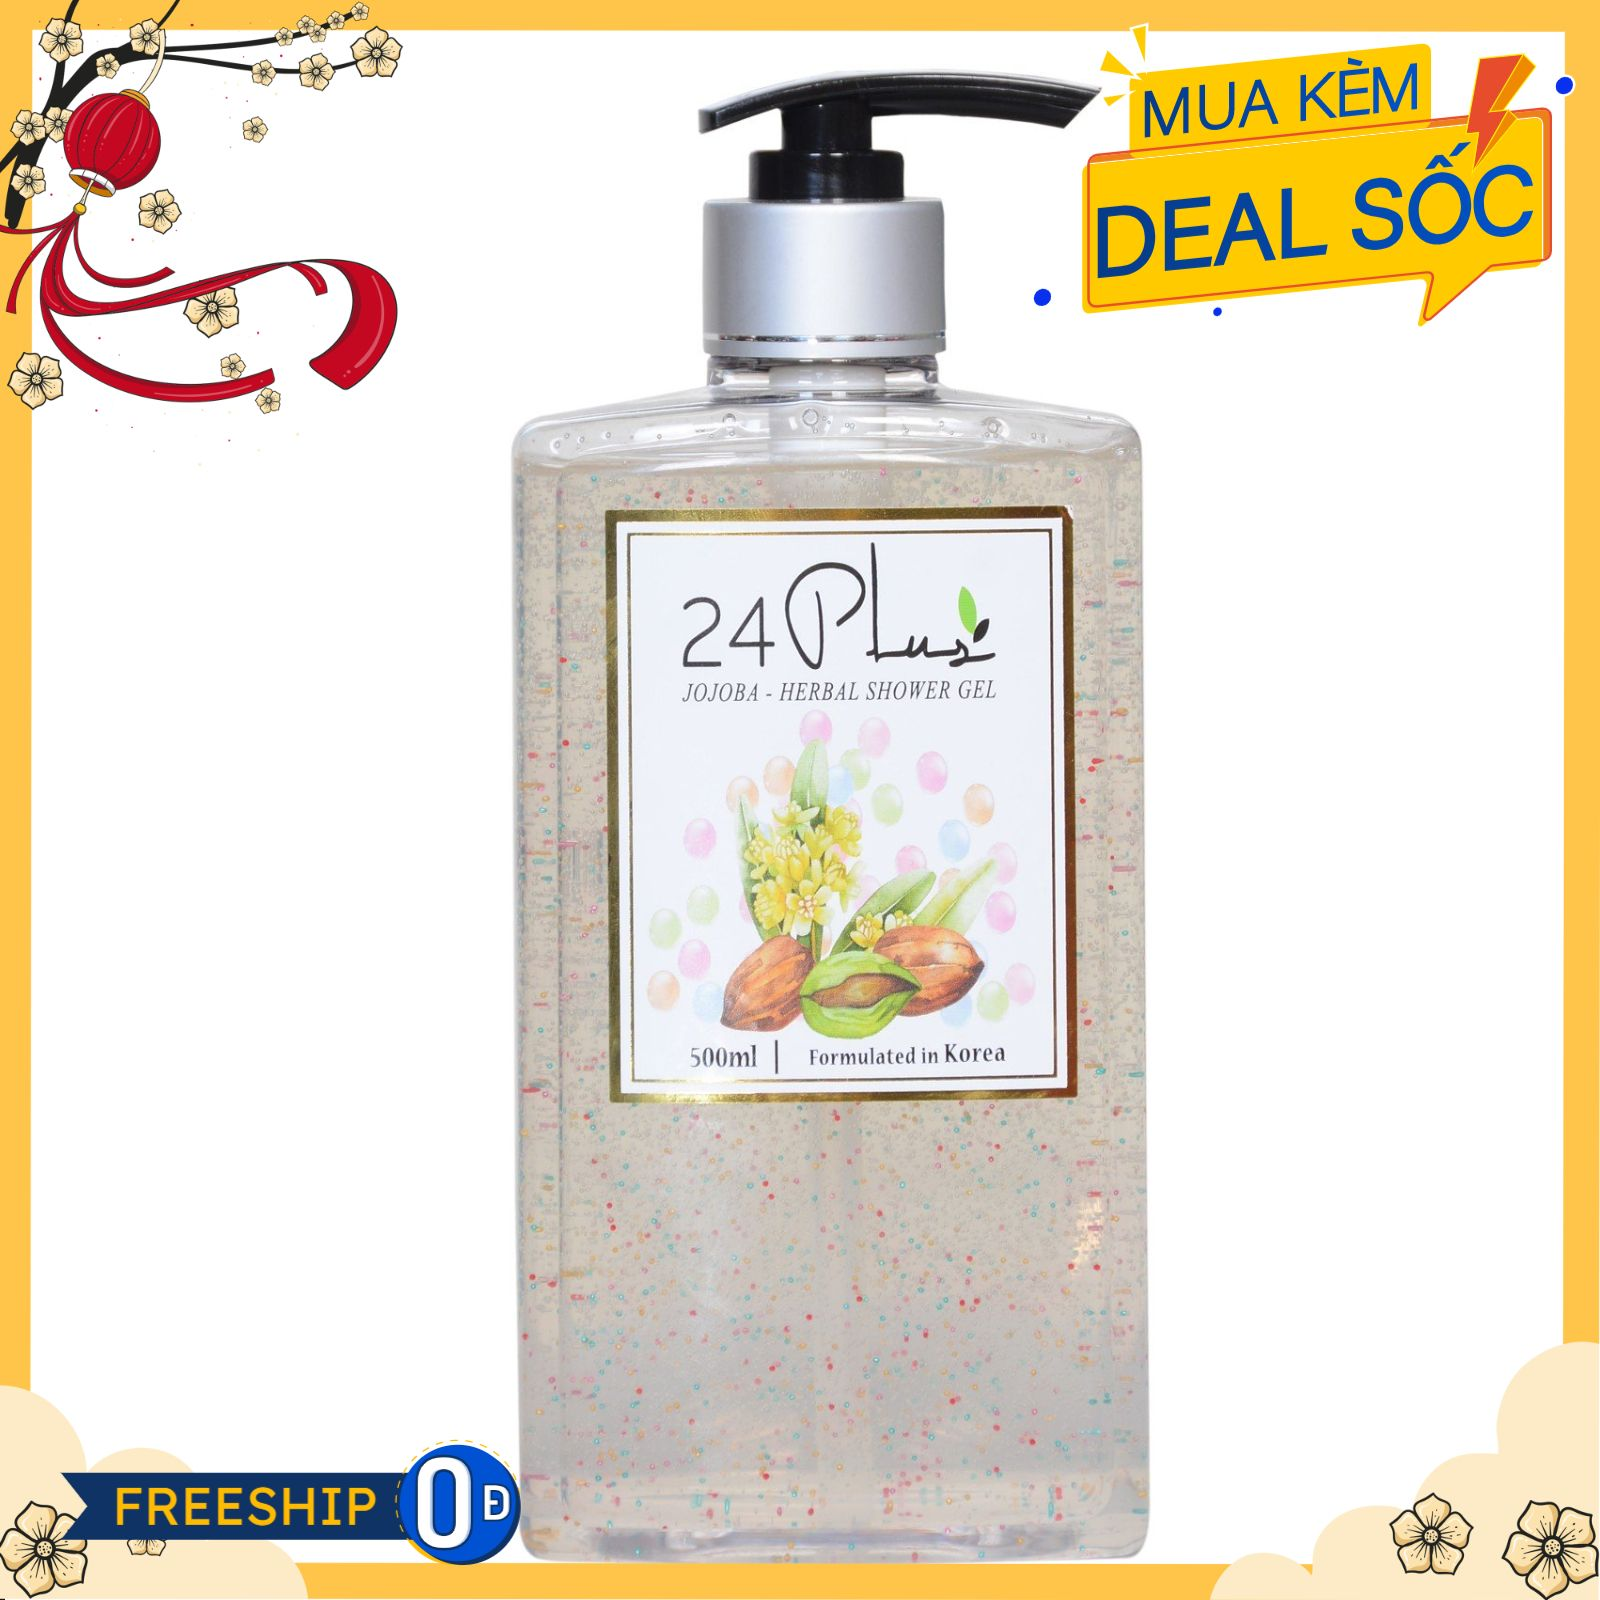 Gel tắm thảo dược jojoba 24 Plus 500ml